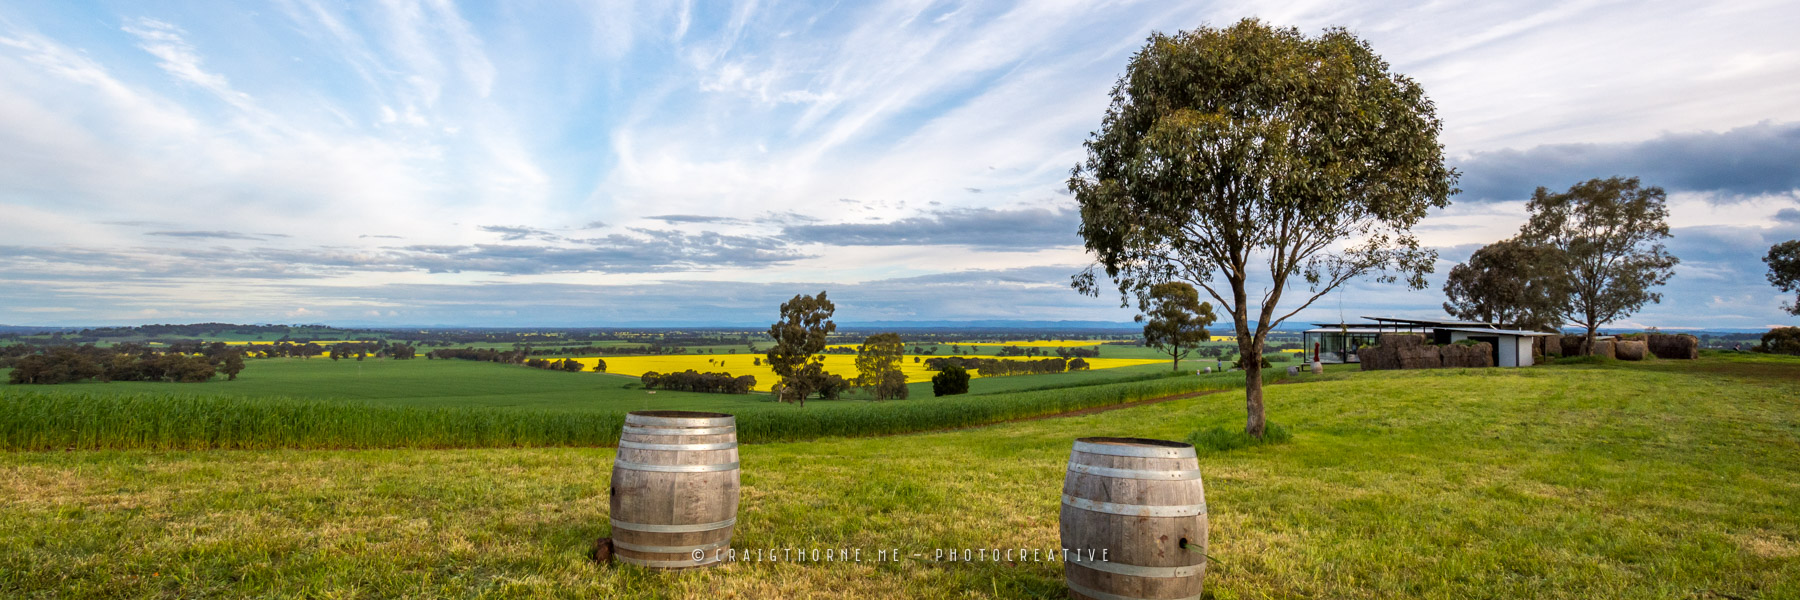 20160917-Tallis-Wines-2016-©CThorne-THN_0485-Pano-LR.jpg